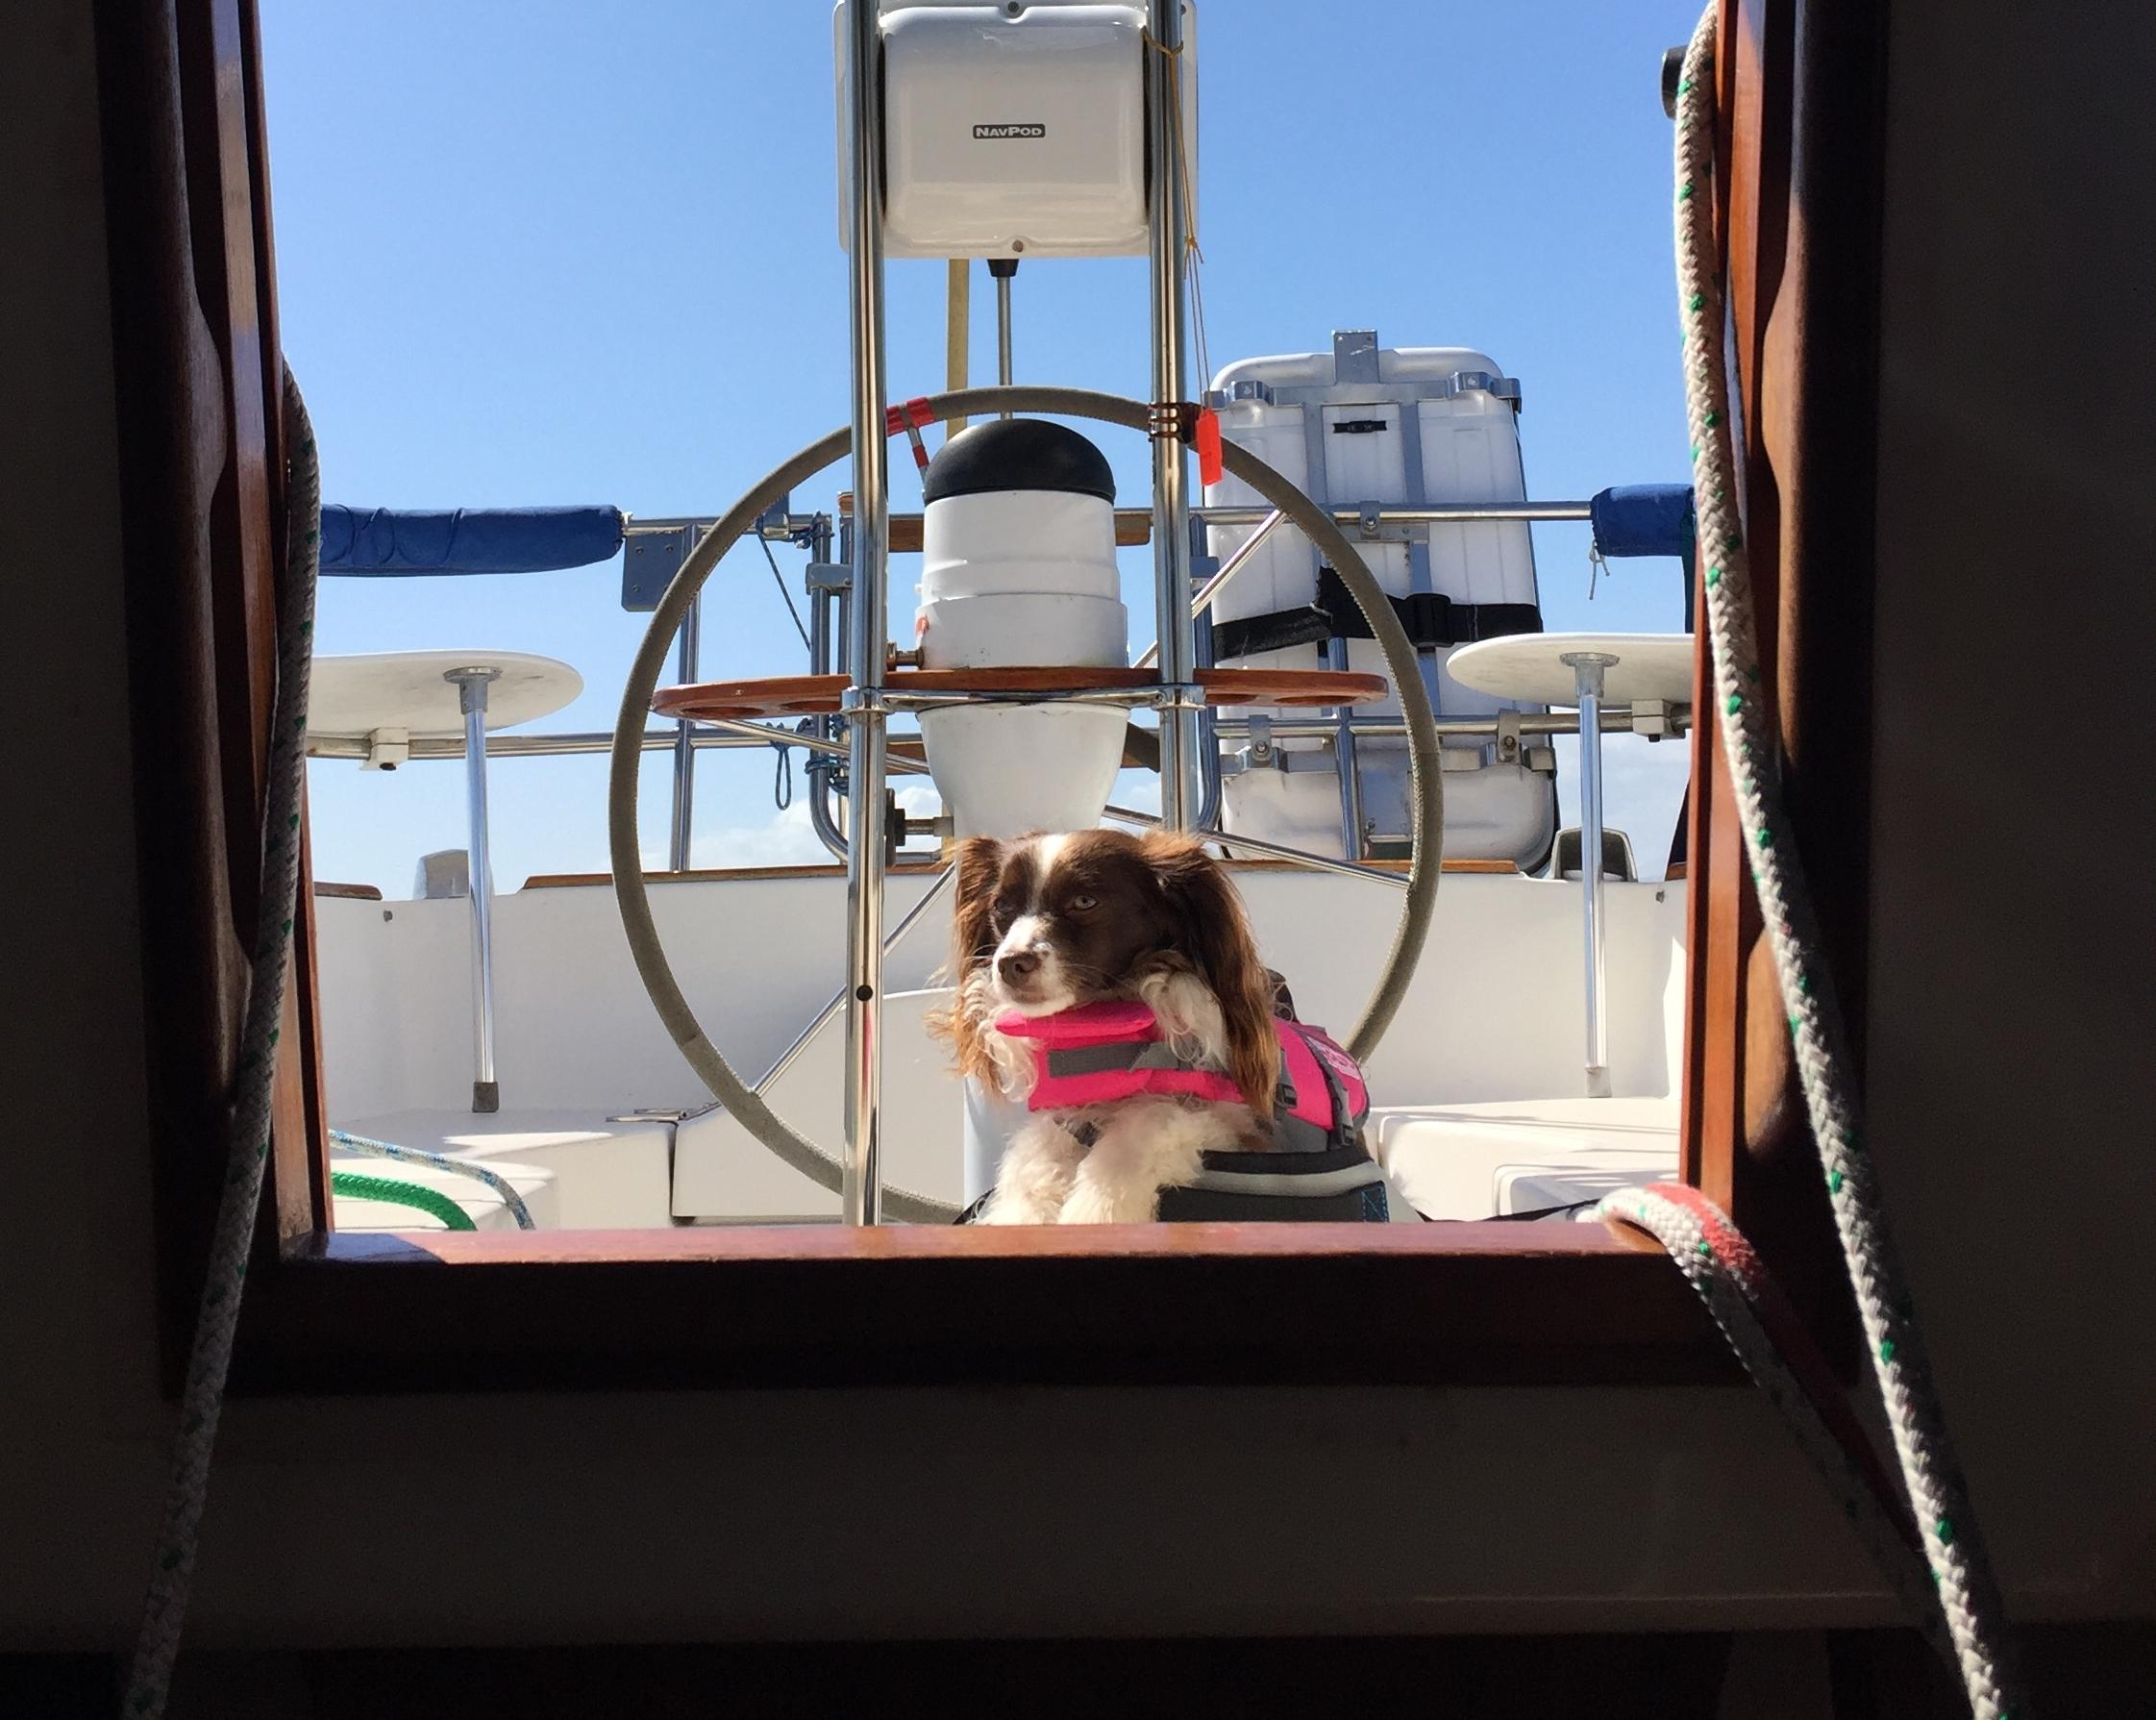 about the dog - Jadzia